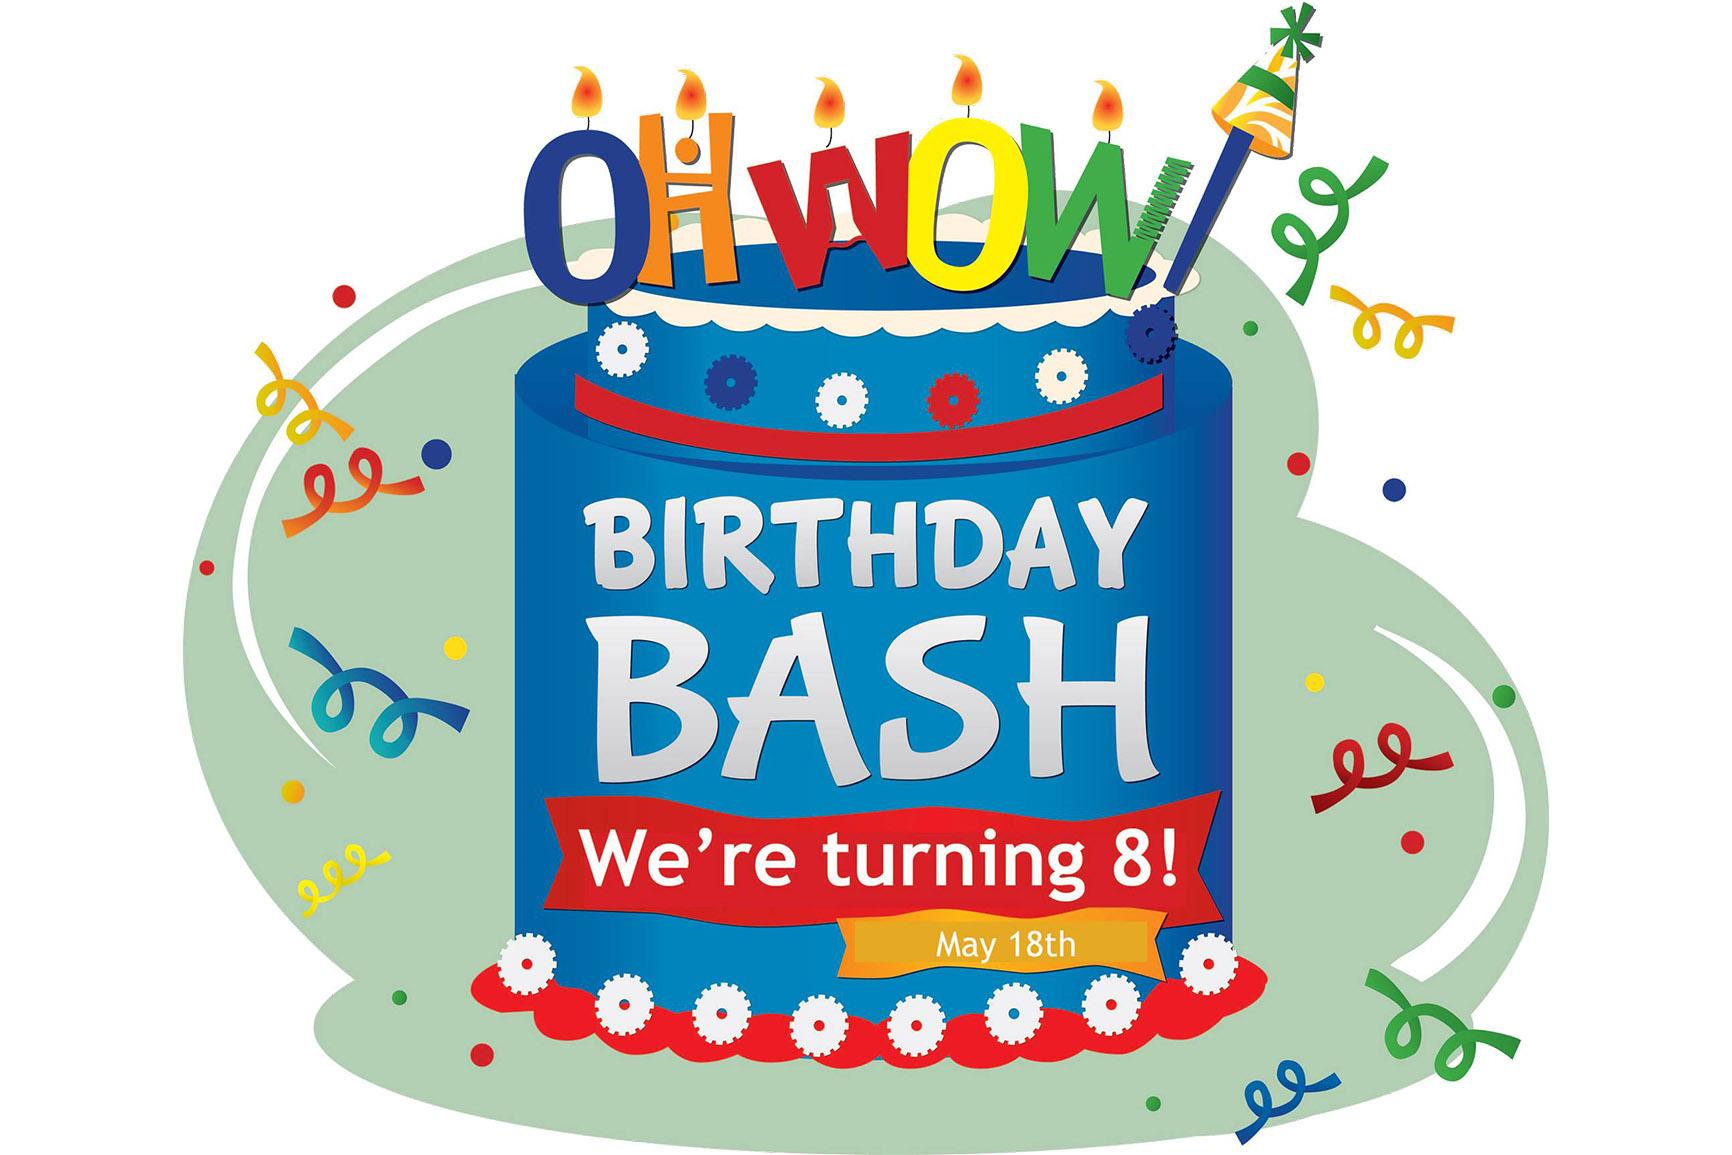 OH WOW! Birthday Bash